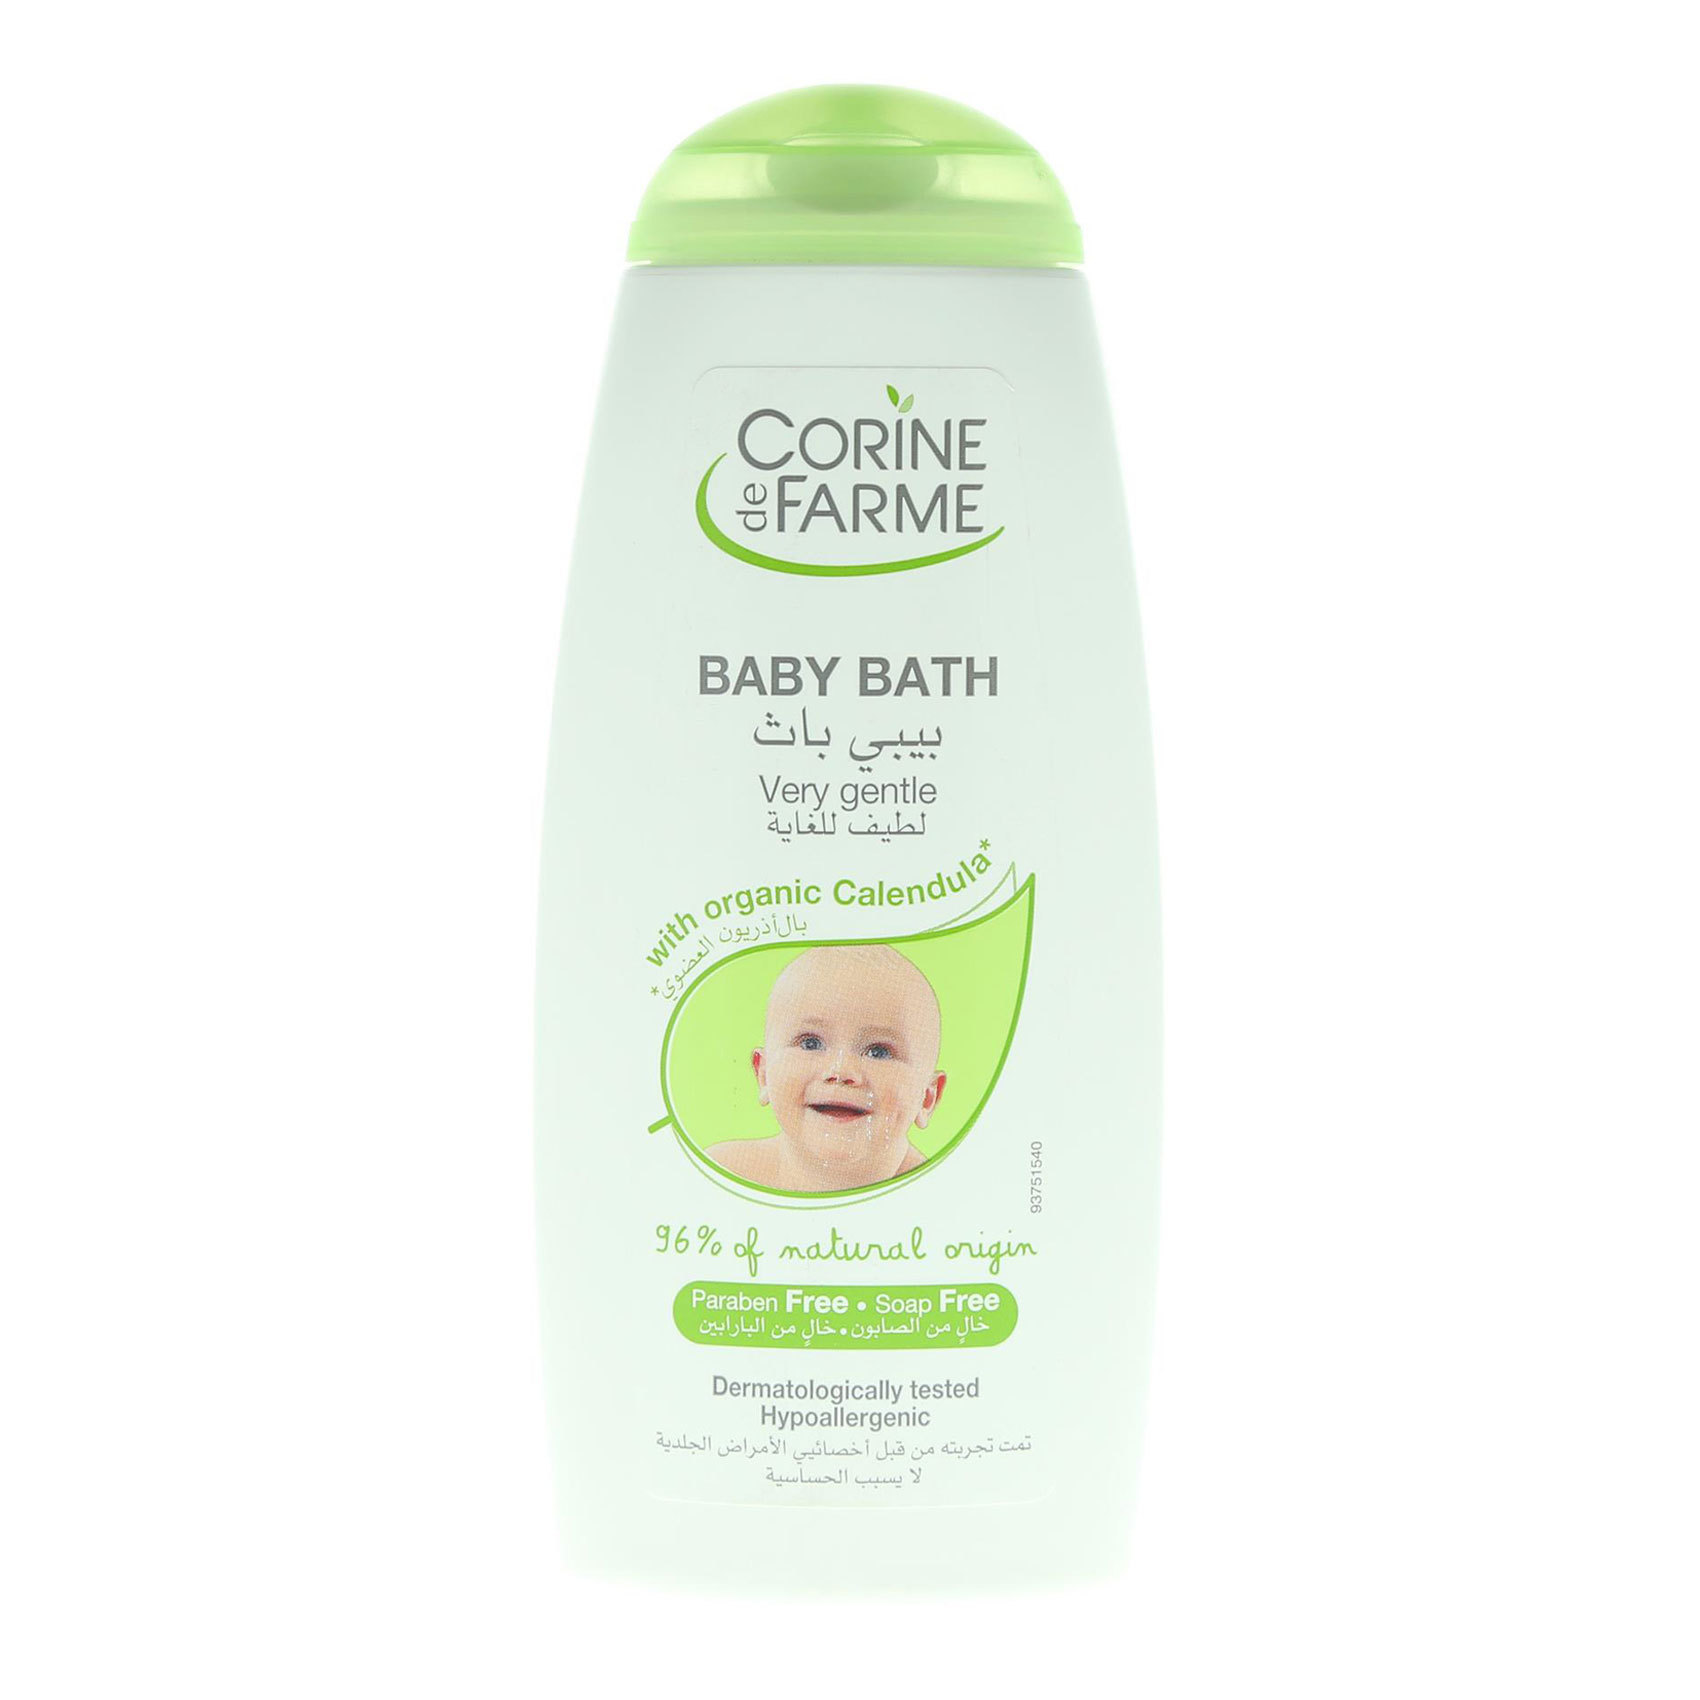 CORINE DE FARME BABY BATH 250ML